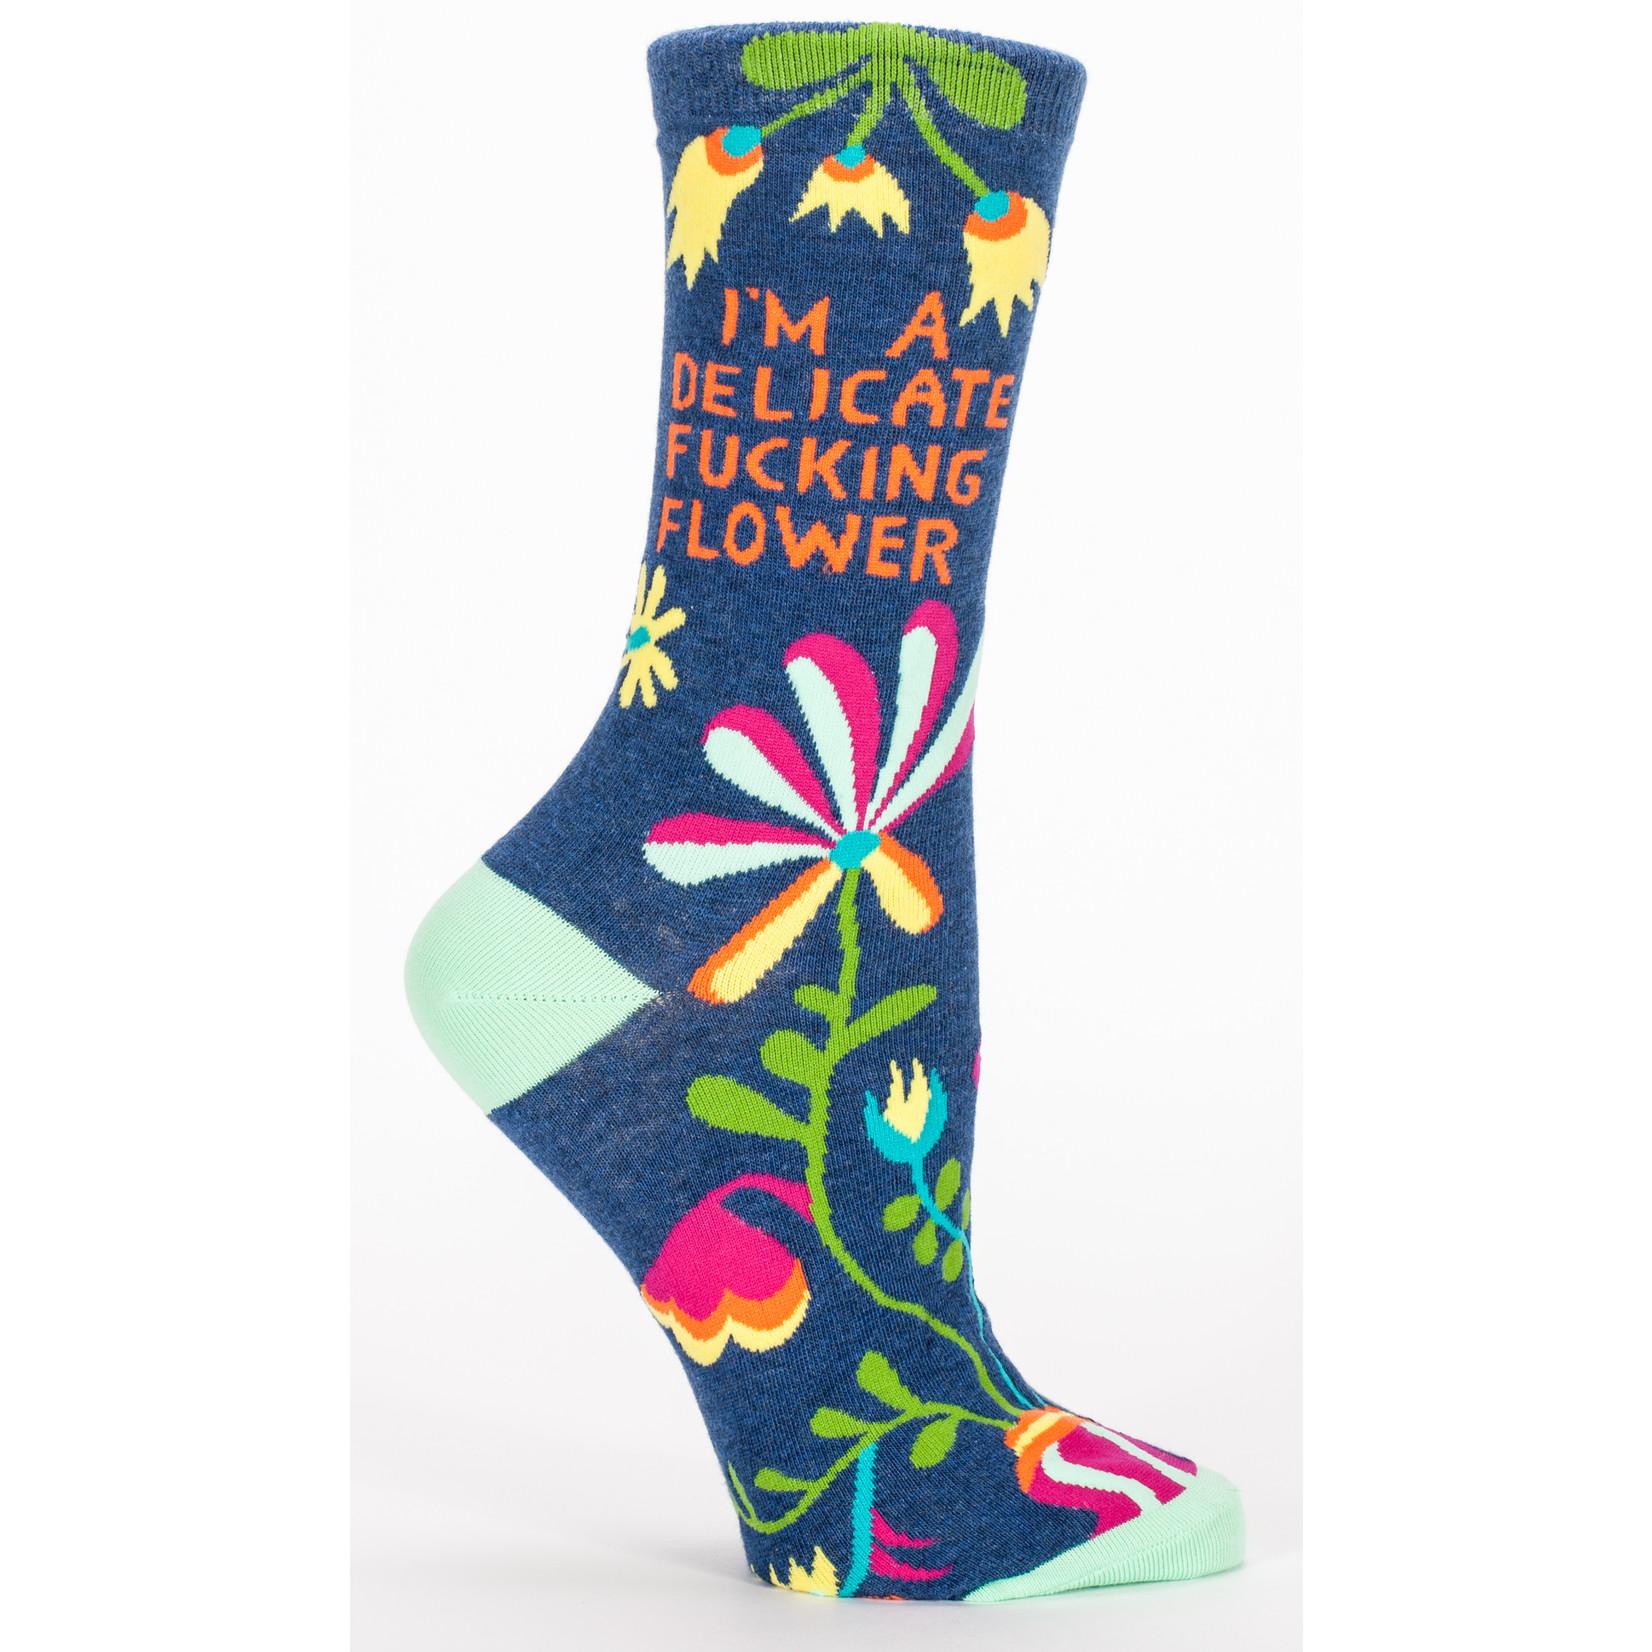 Blue Q Delicate Fucking Flower W - Crew Socks